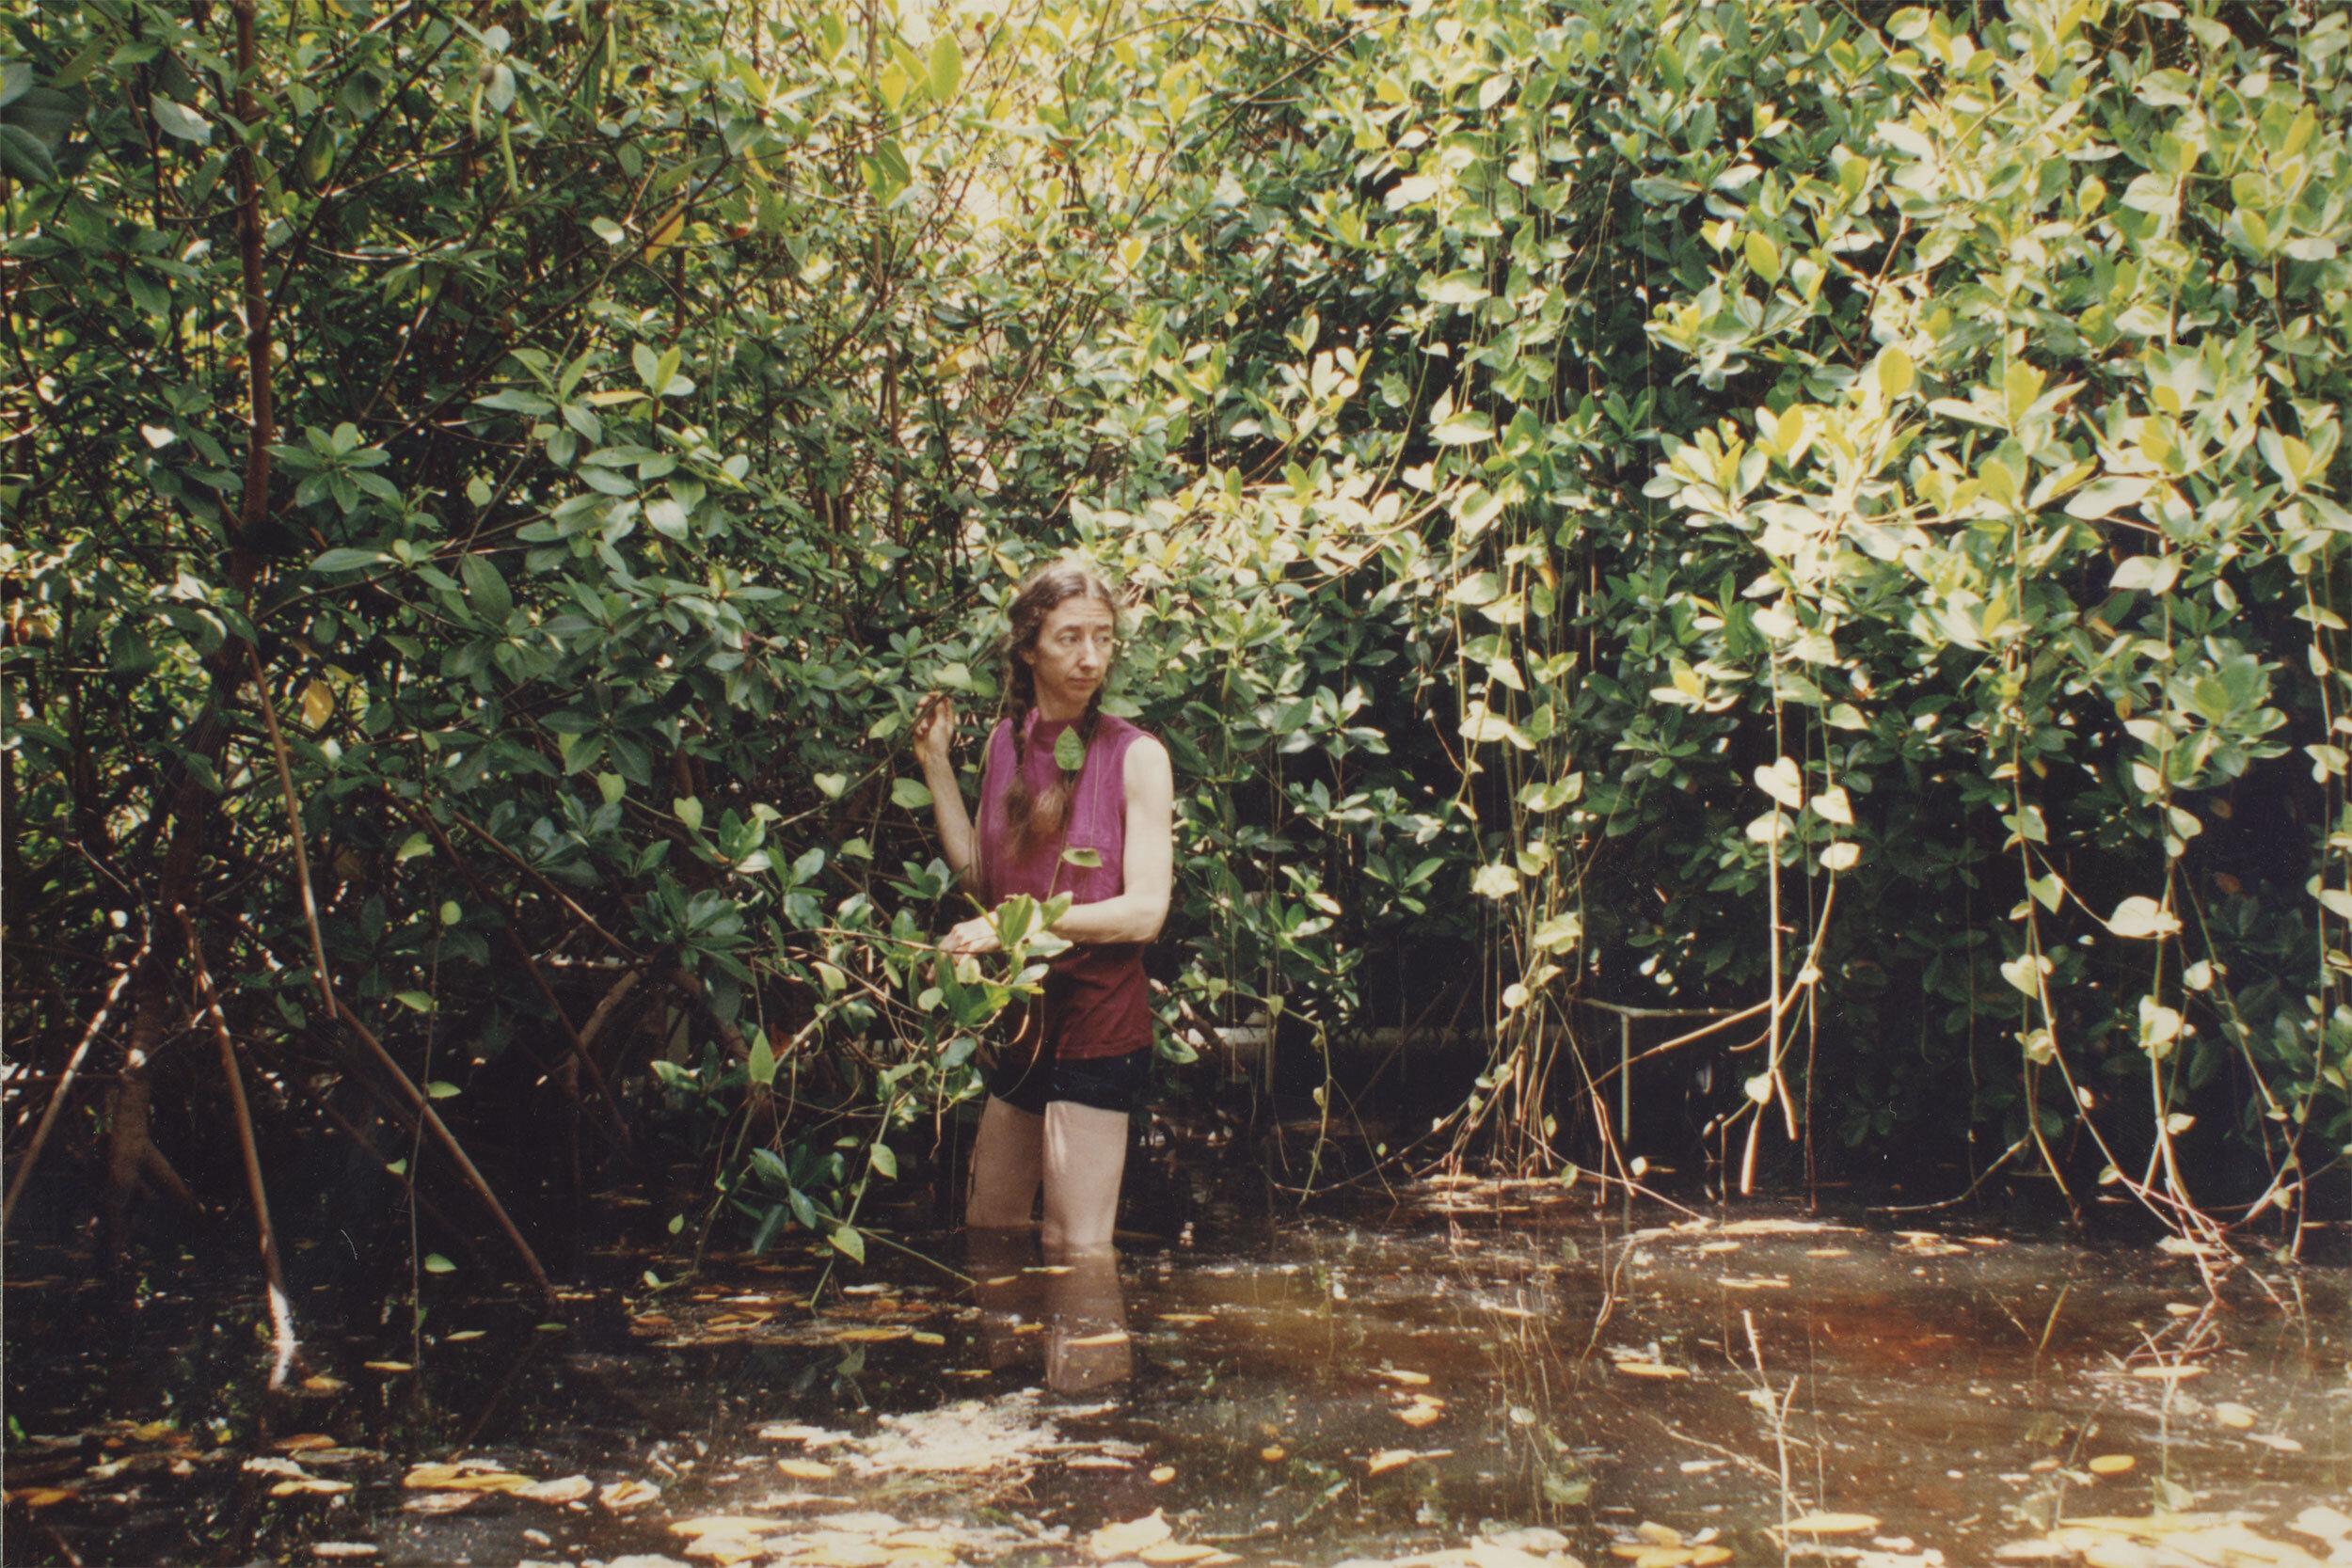 Biospherian Linda Leigh in the mangrove biome